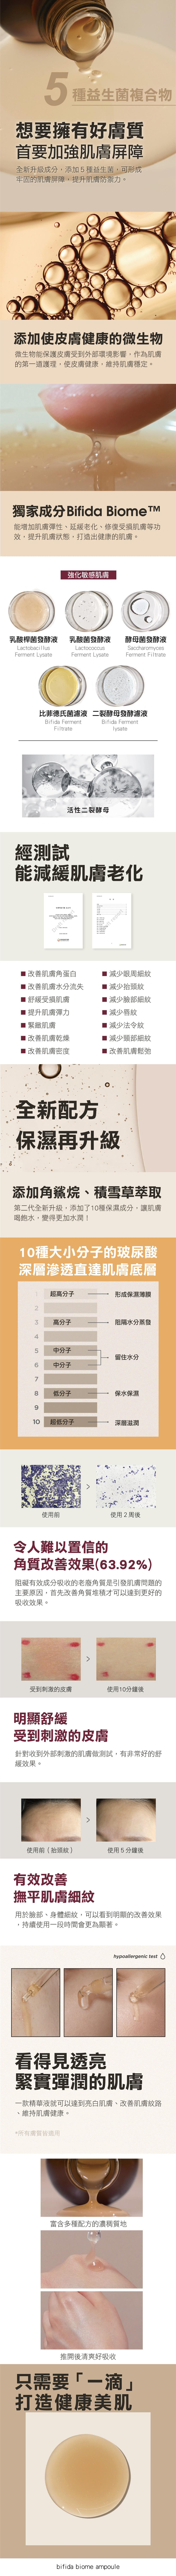 manyo-bifida%e5%b0%8f%e6%a3%95%e7%93%b602